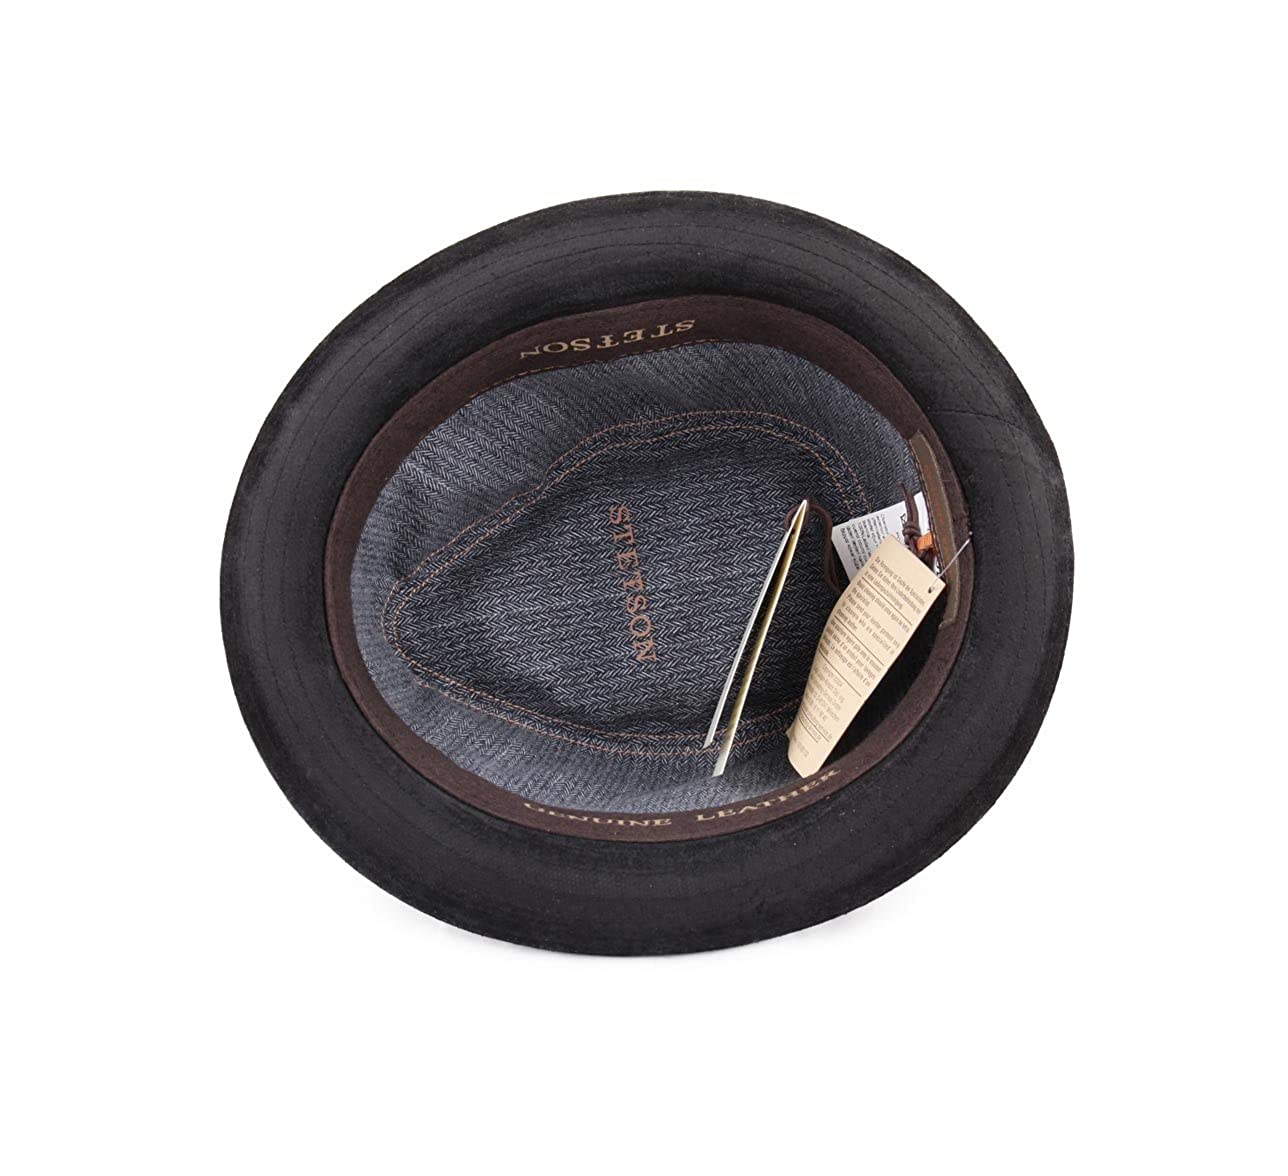 Stetson - Trilby Hat men Radcliff  Amazon.co.uk  Clothing ae9b99b03c2e